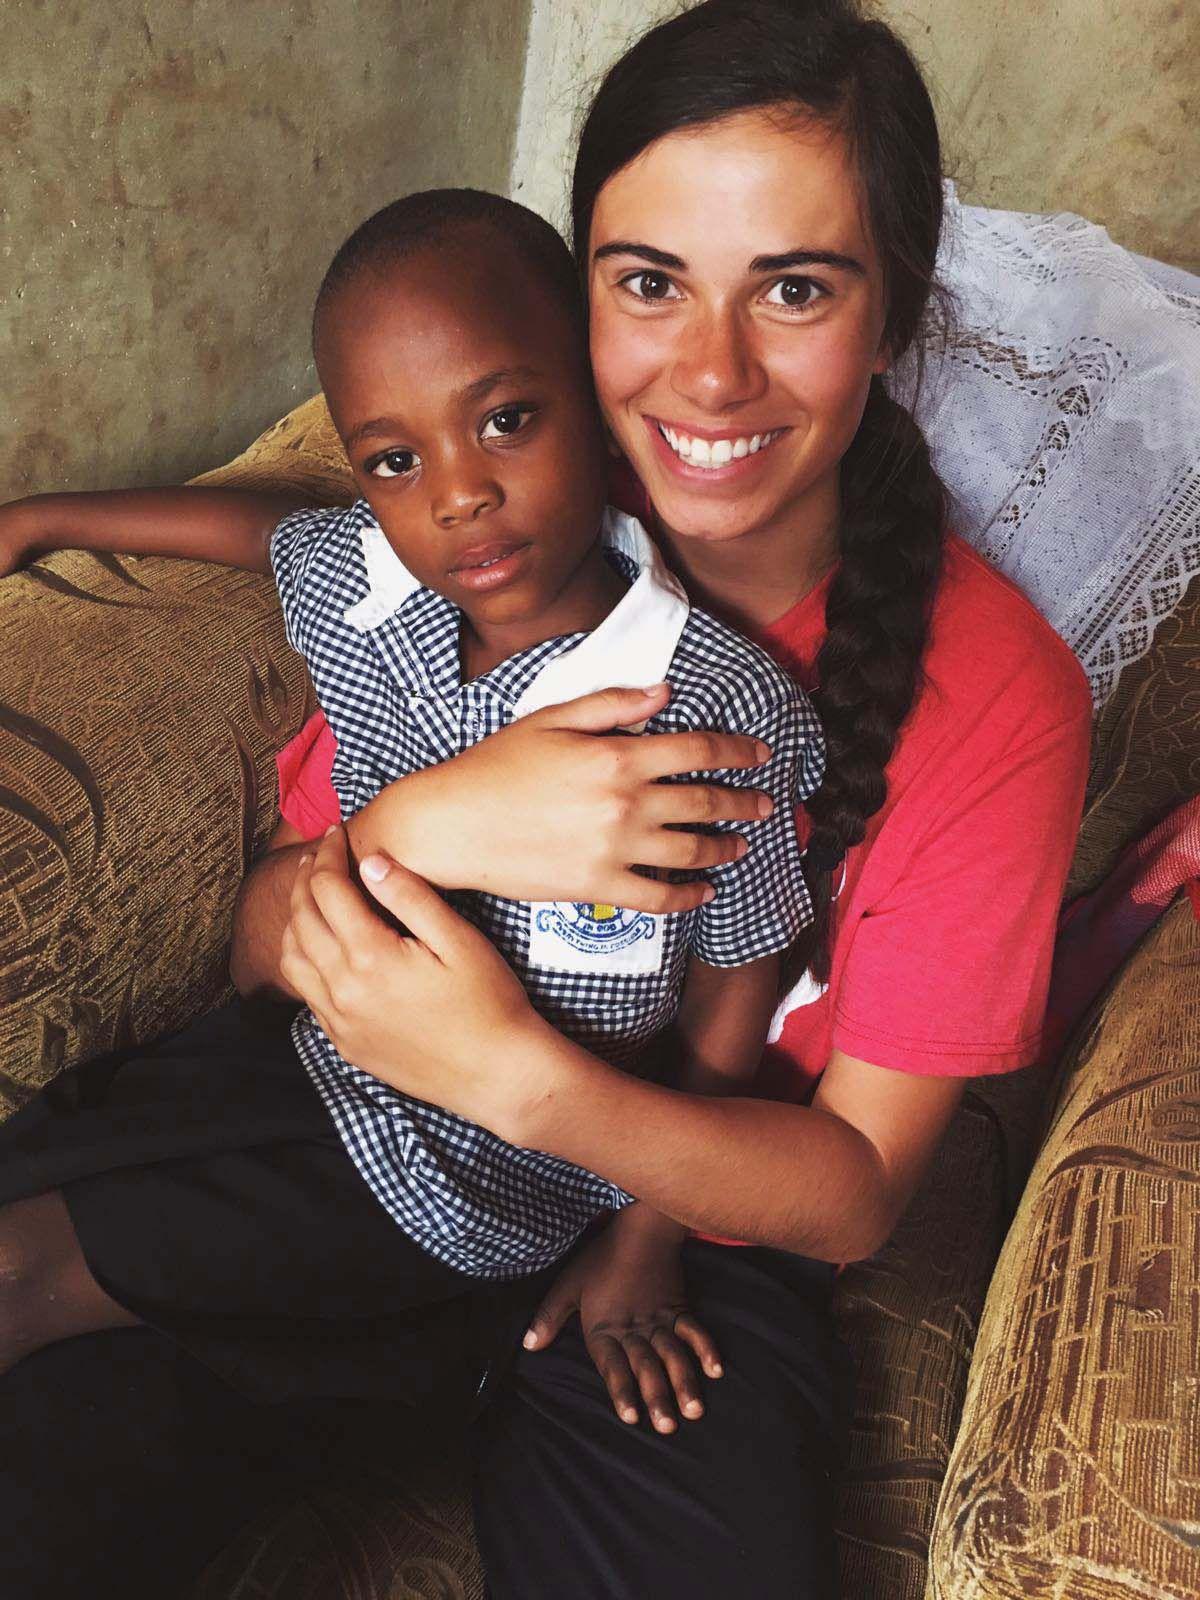 Bella with little boy